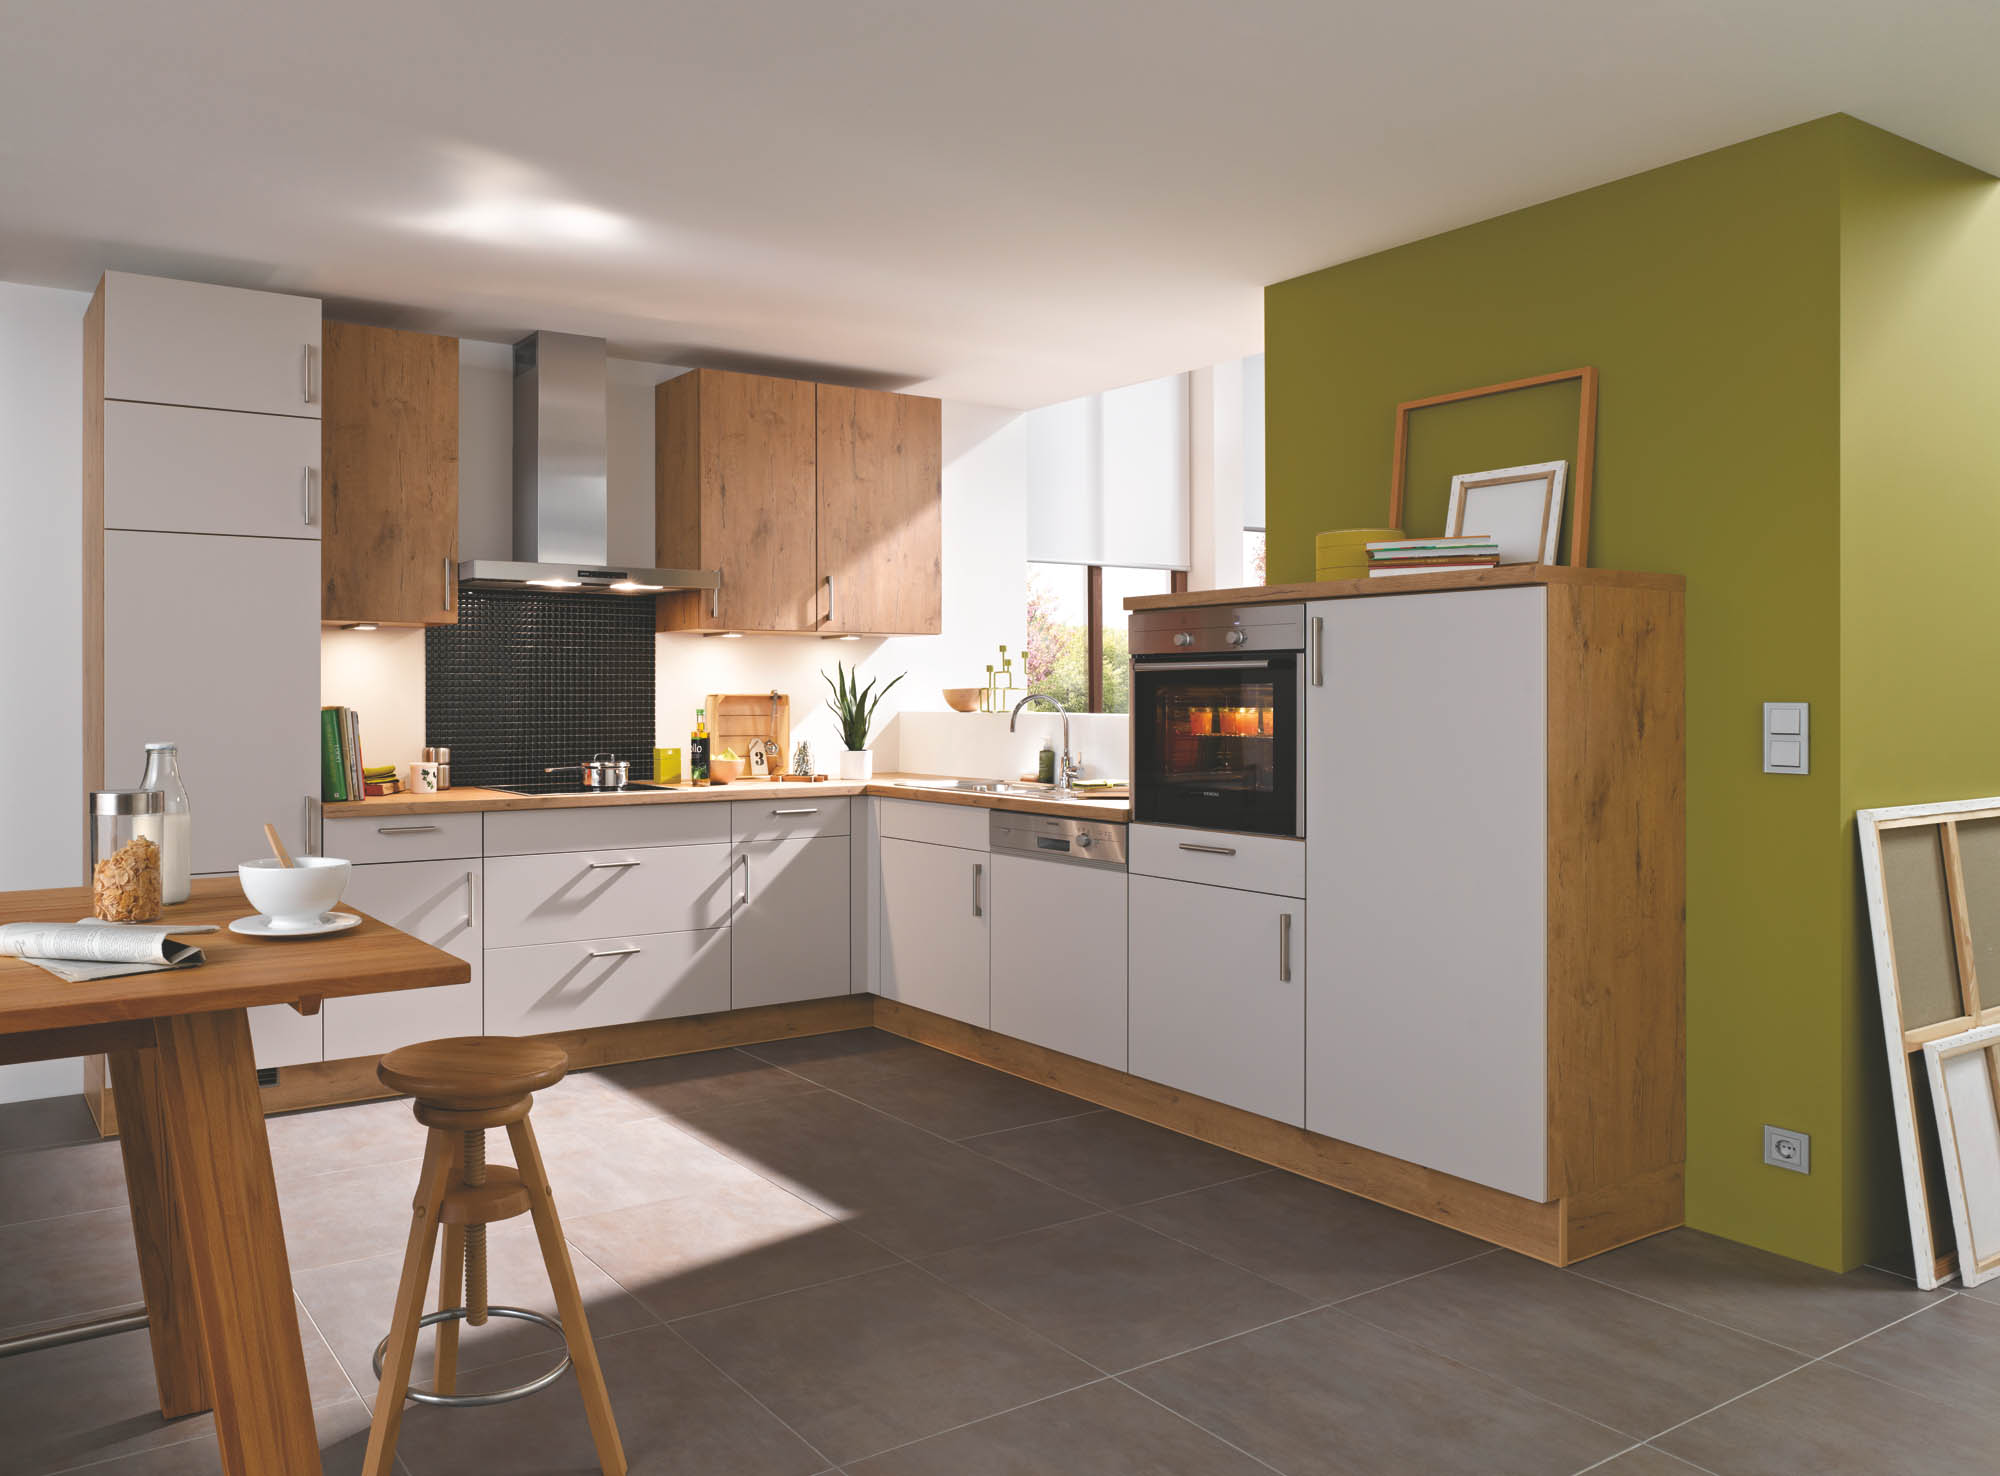 Full Size of Küchen Aktuell Kche Finanzieren Sinnvoll Kchen Trotz Hauskredit Regal Wohnzimmer Küchen Aktuell